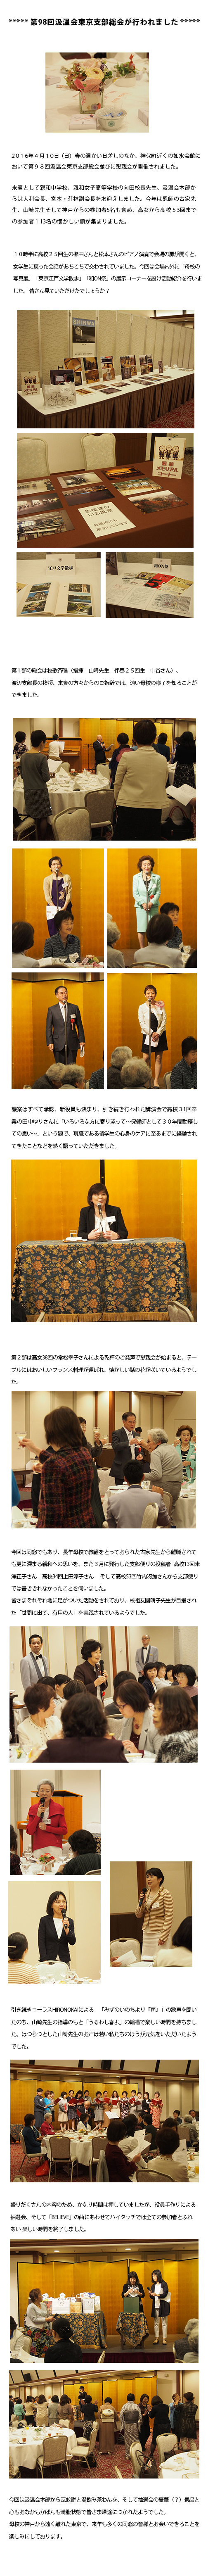 H28東京支部総会HP用原稿.png